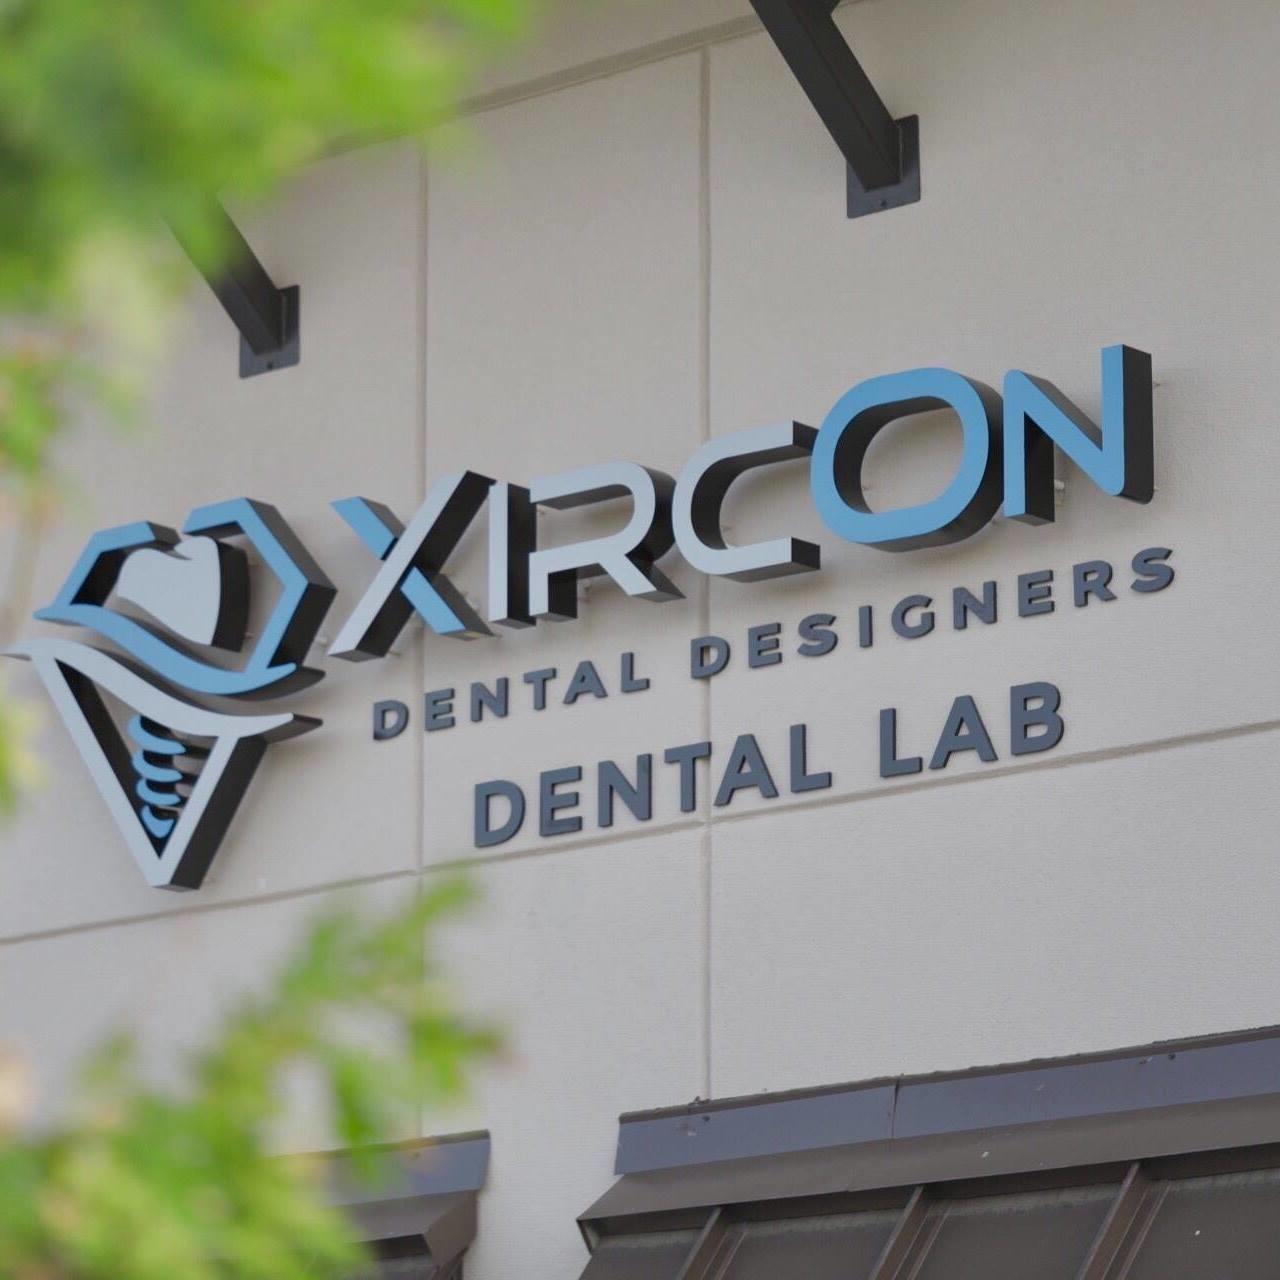 XircOn Dental Designers